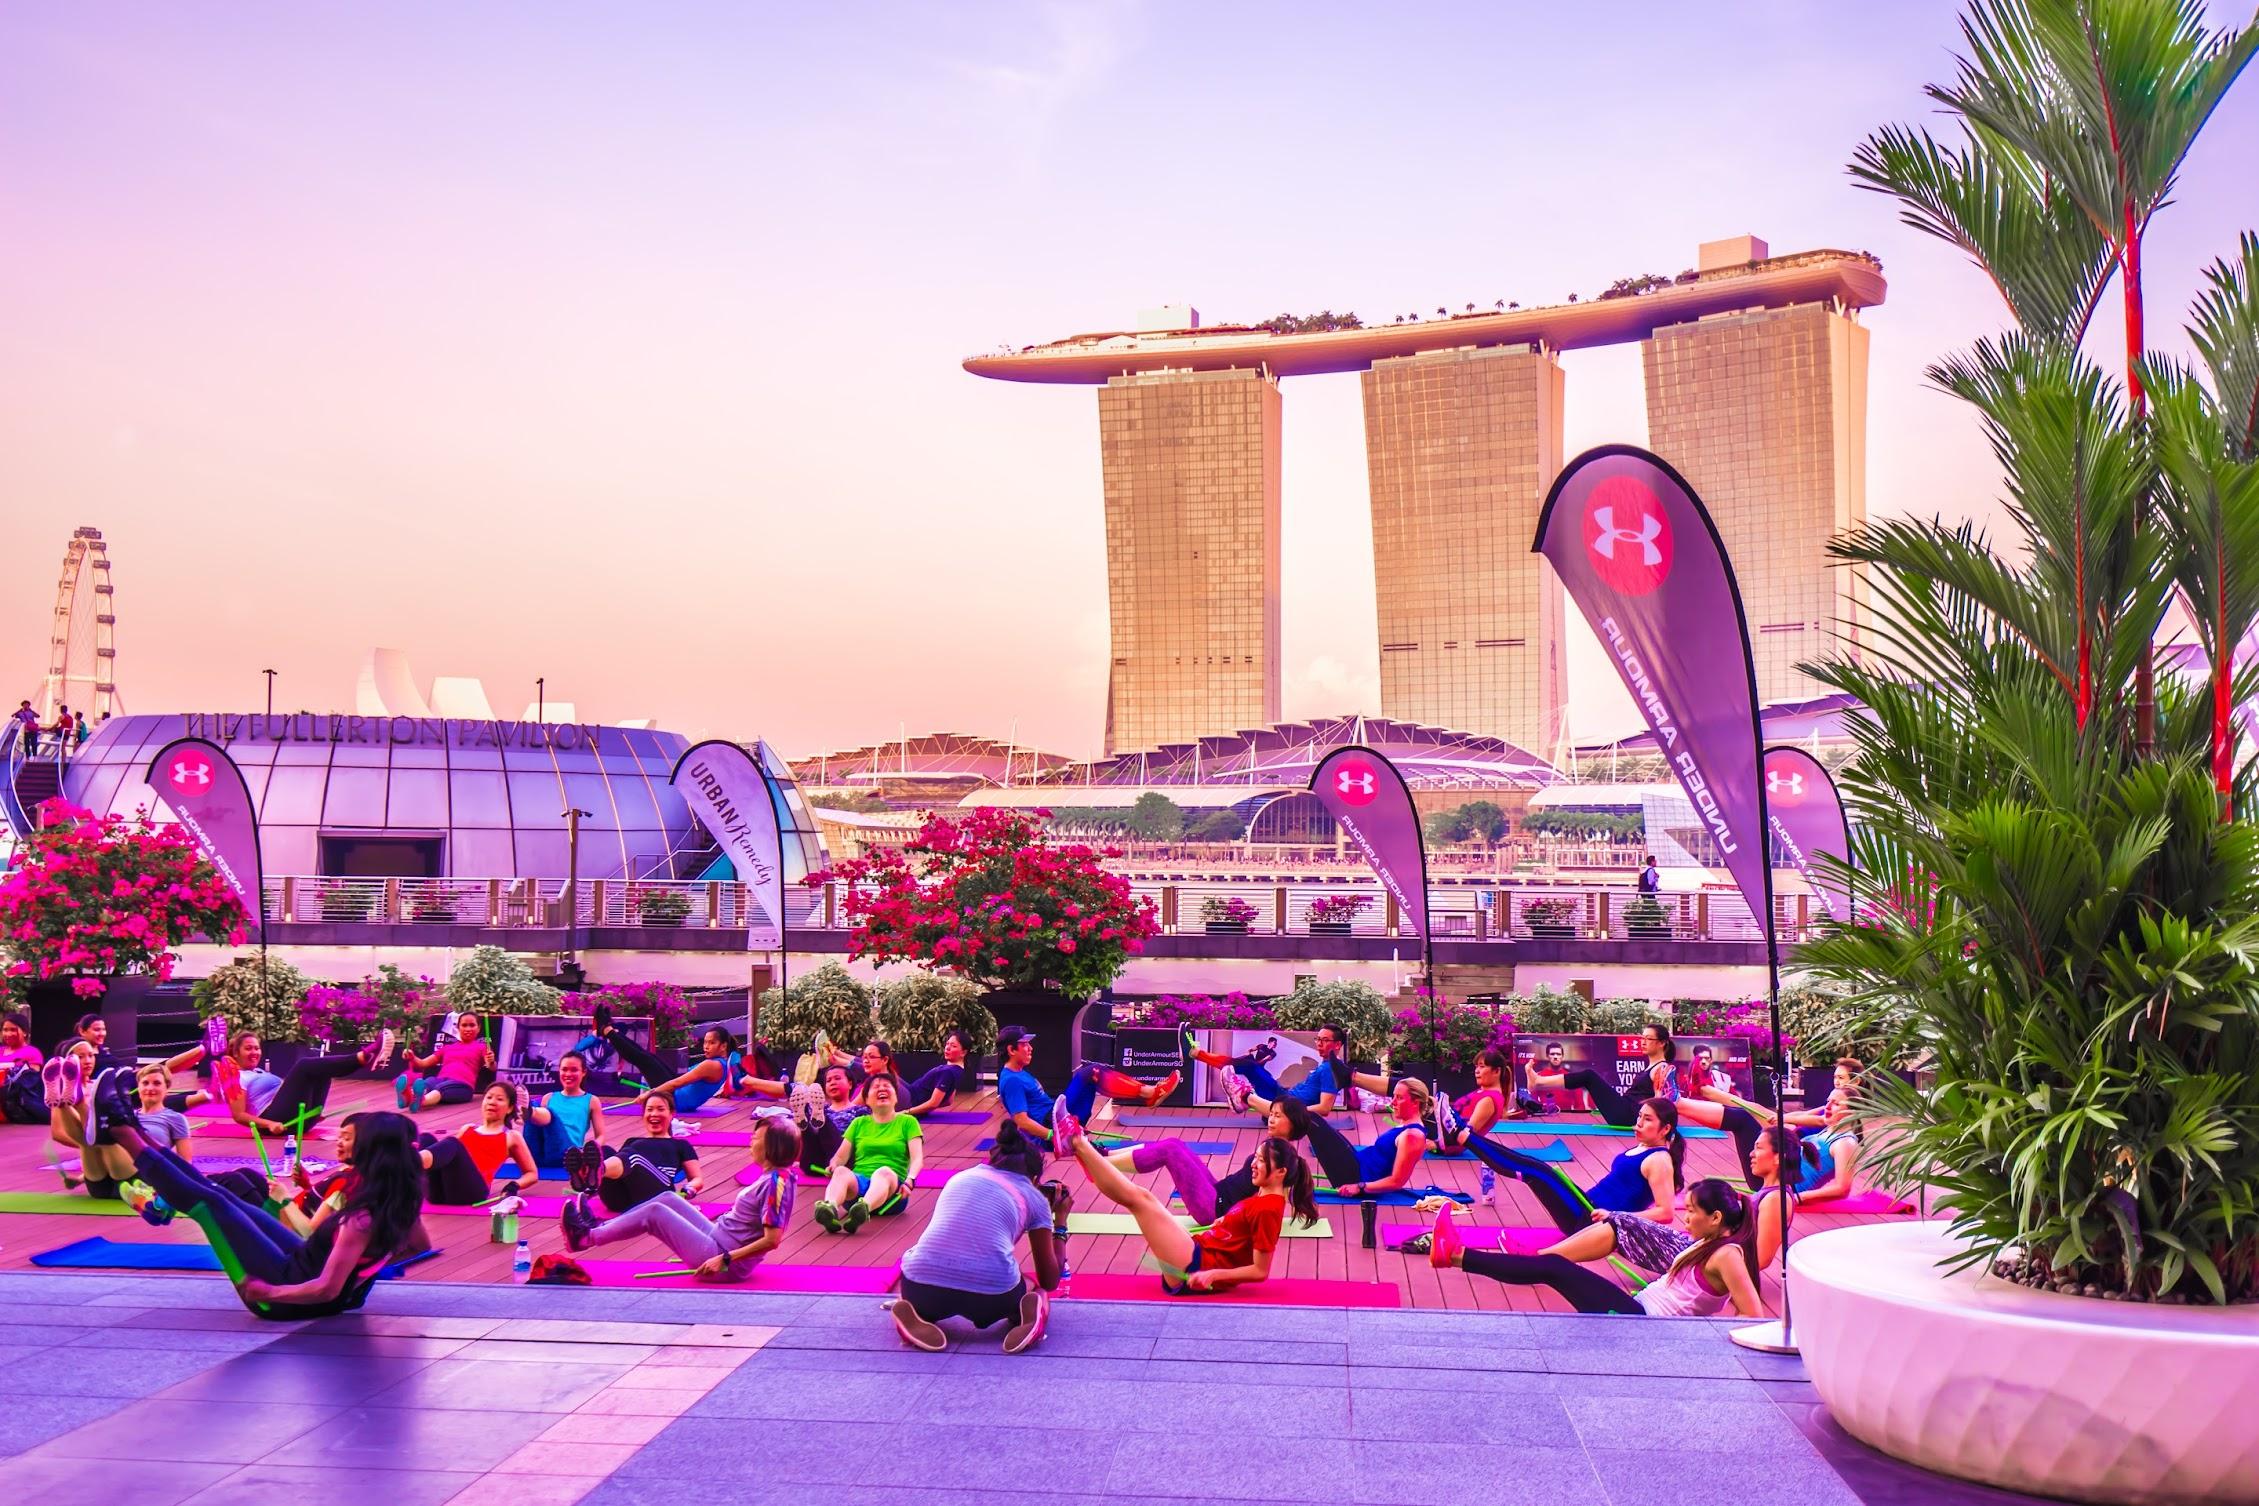 Singapore Group exercise